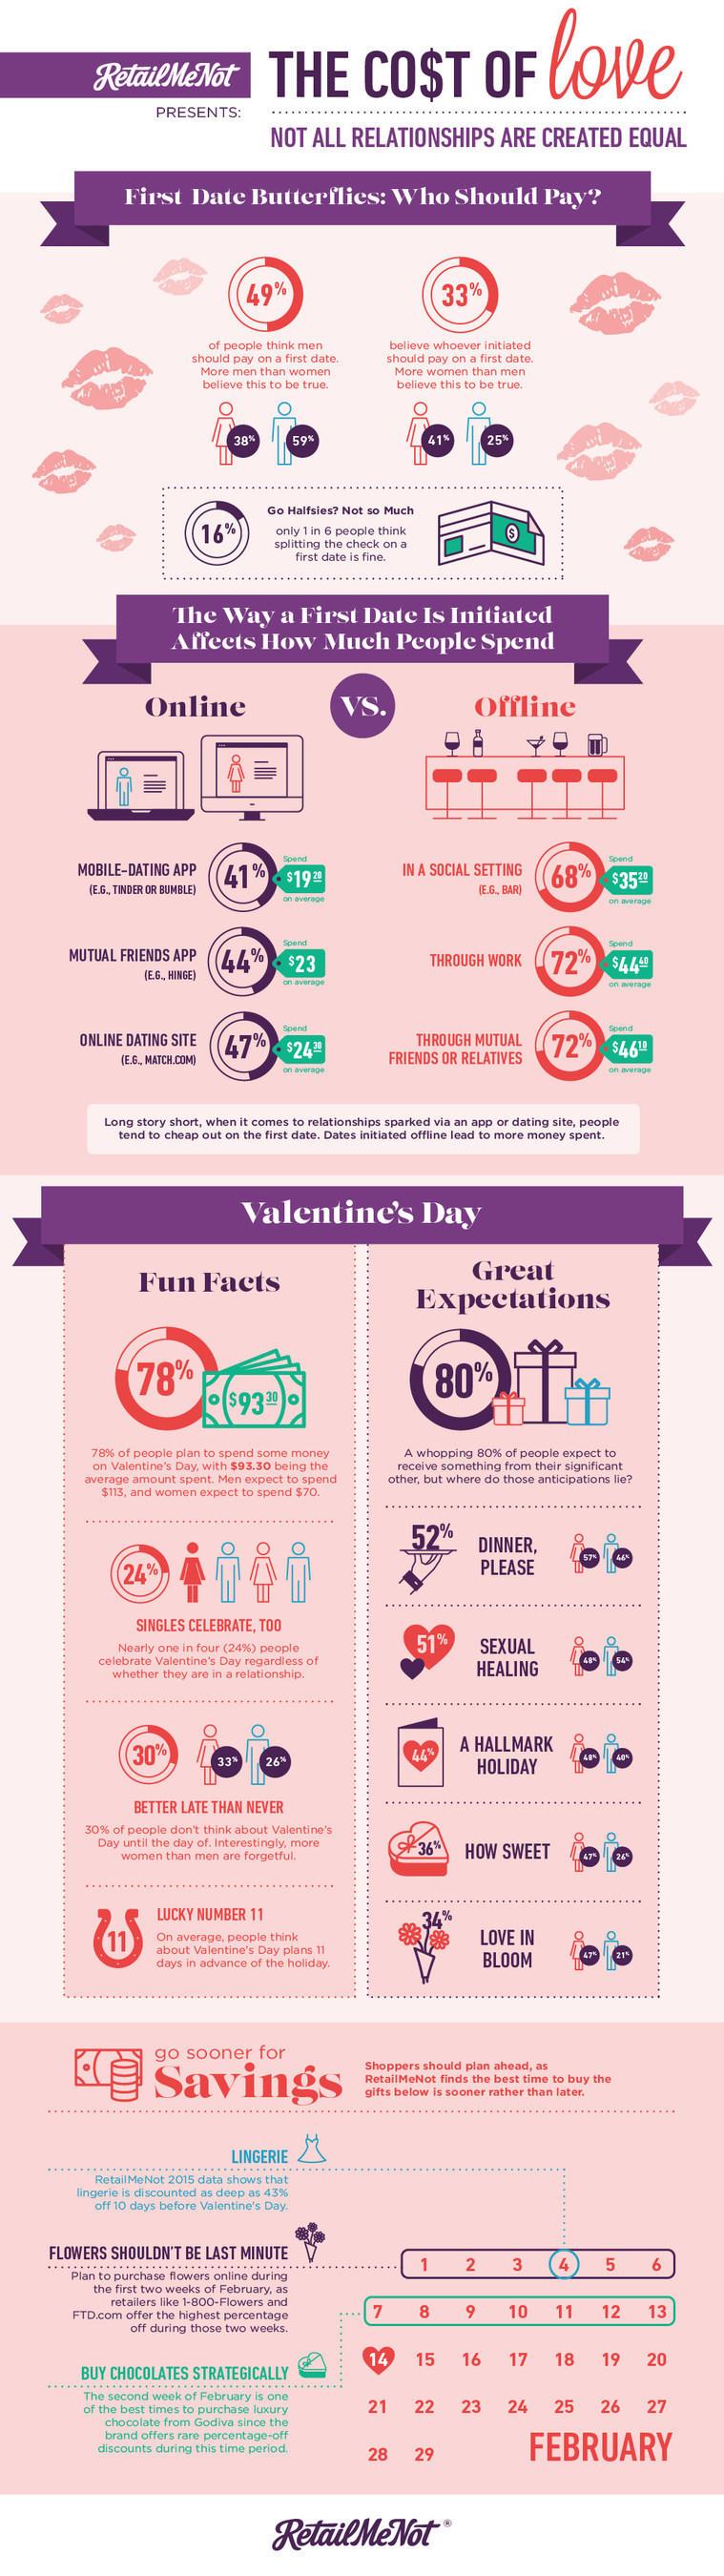 RetailMeNot Presents: The Cost of Love